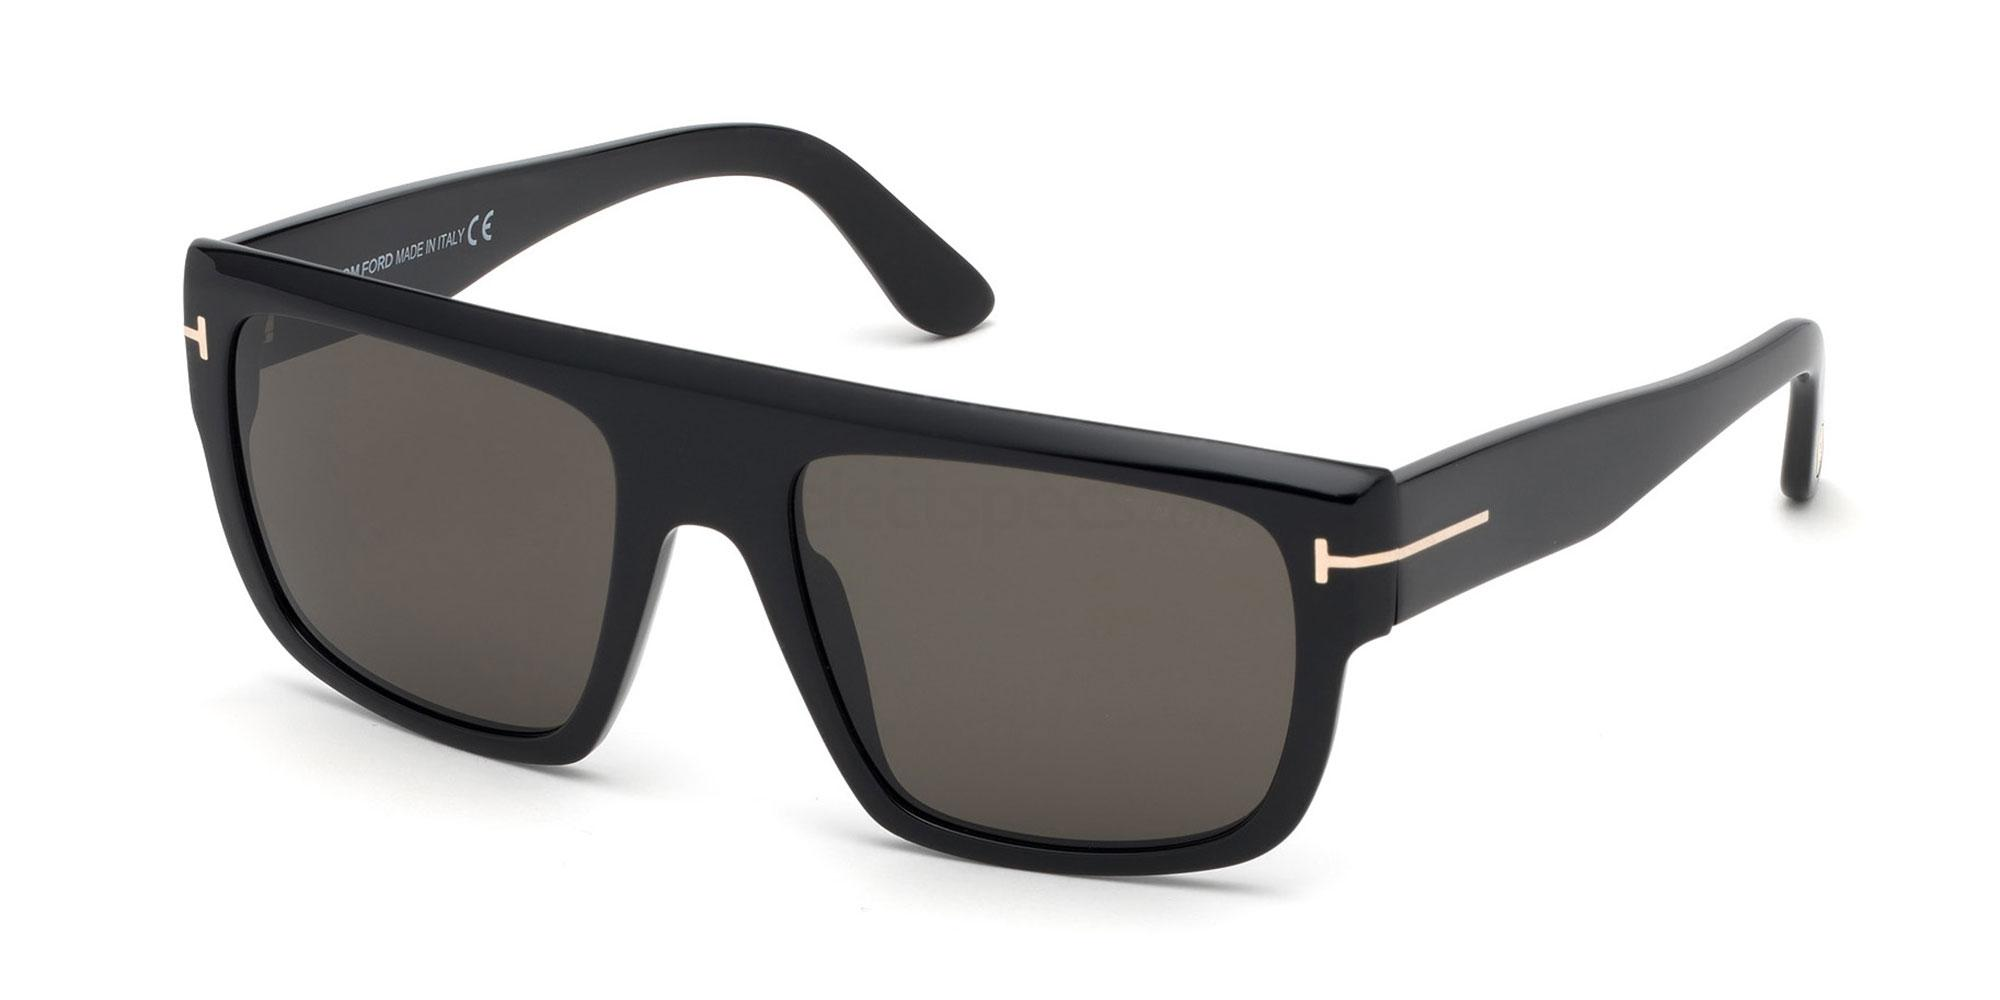 01A FT0699 Sunglasses, Tom Ford